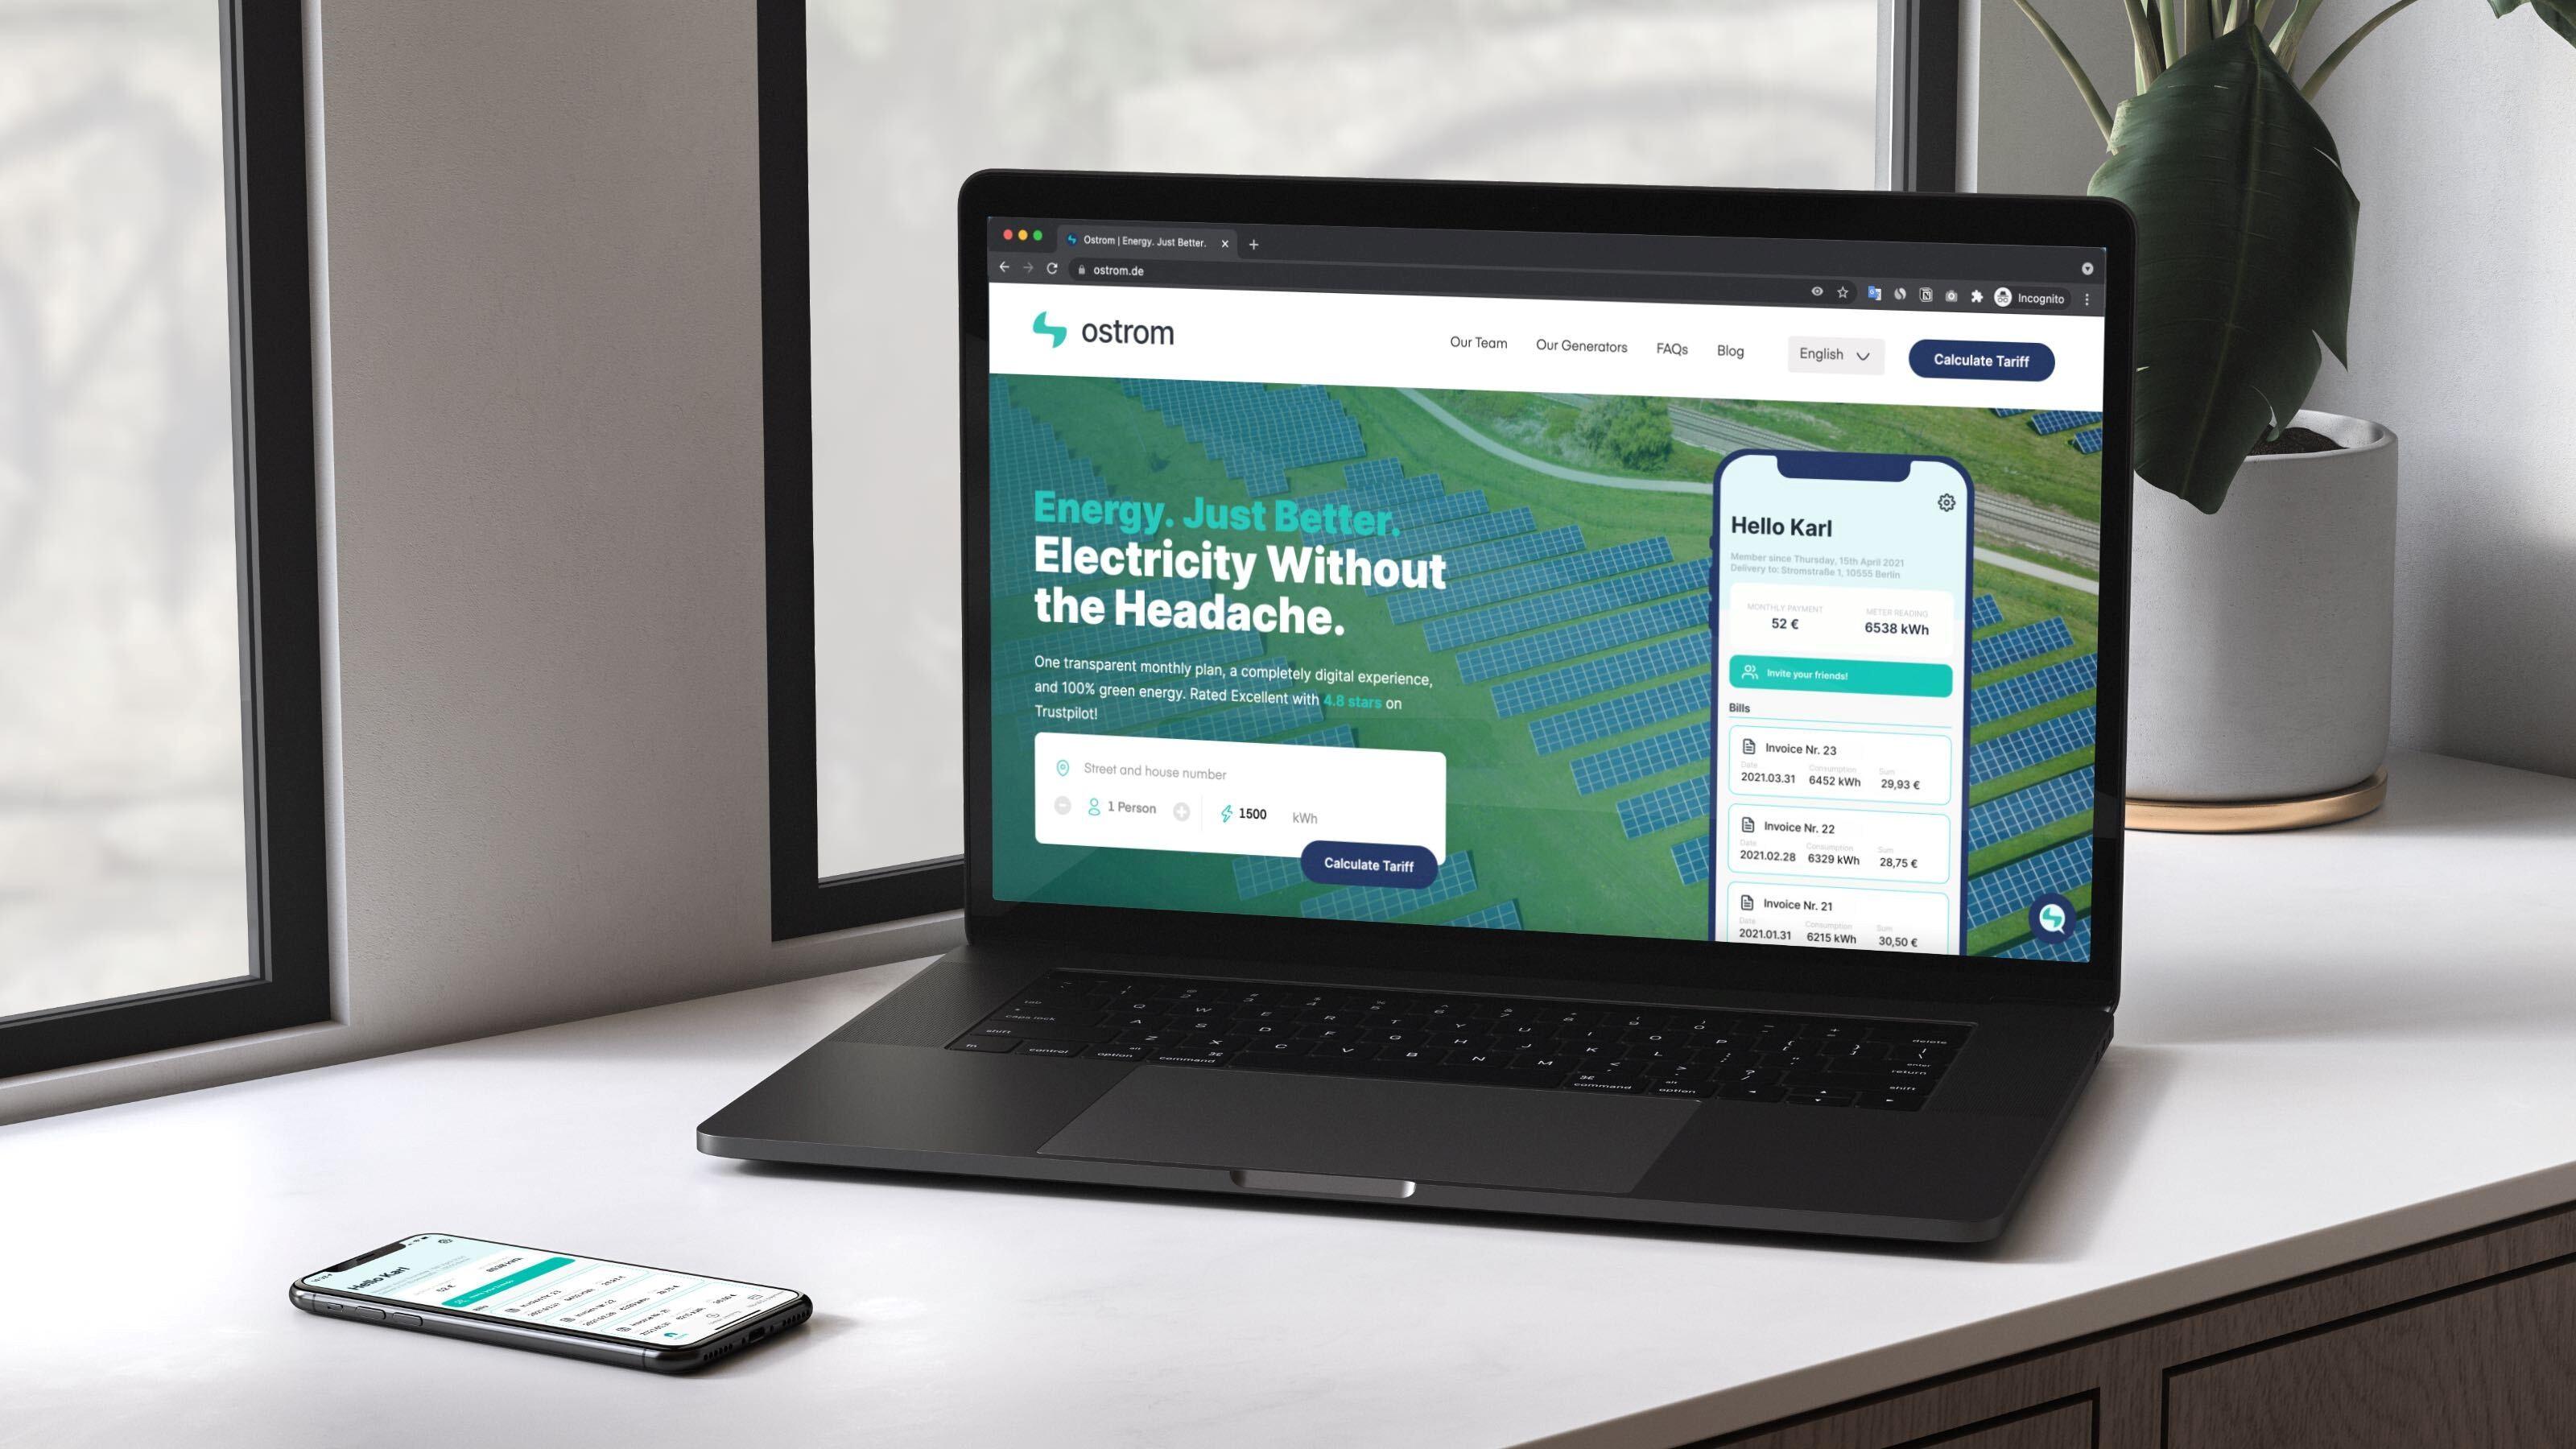 powercloud-ostrom-webinar